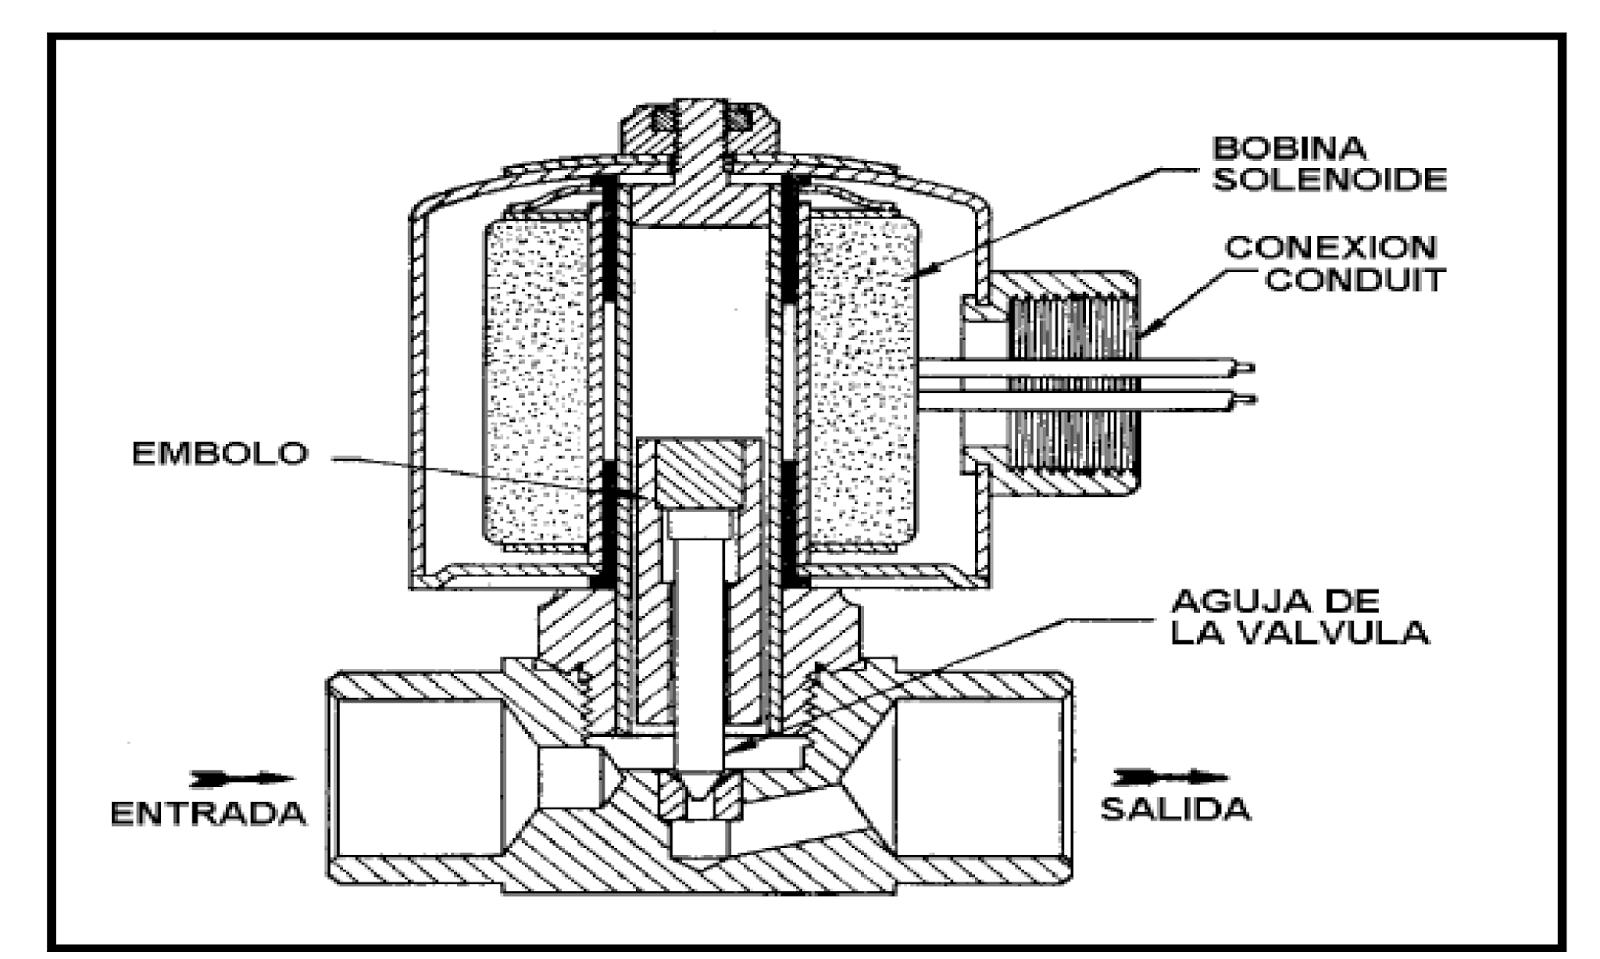 [DIAGRAM] For Lgpressor Wiring Diagram FULL Version HD